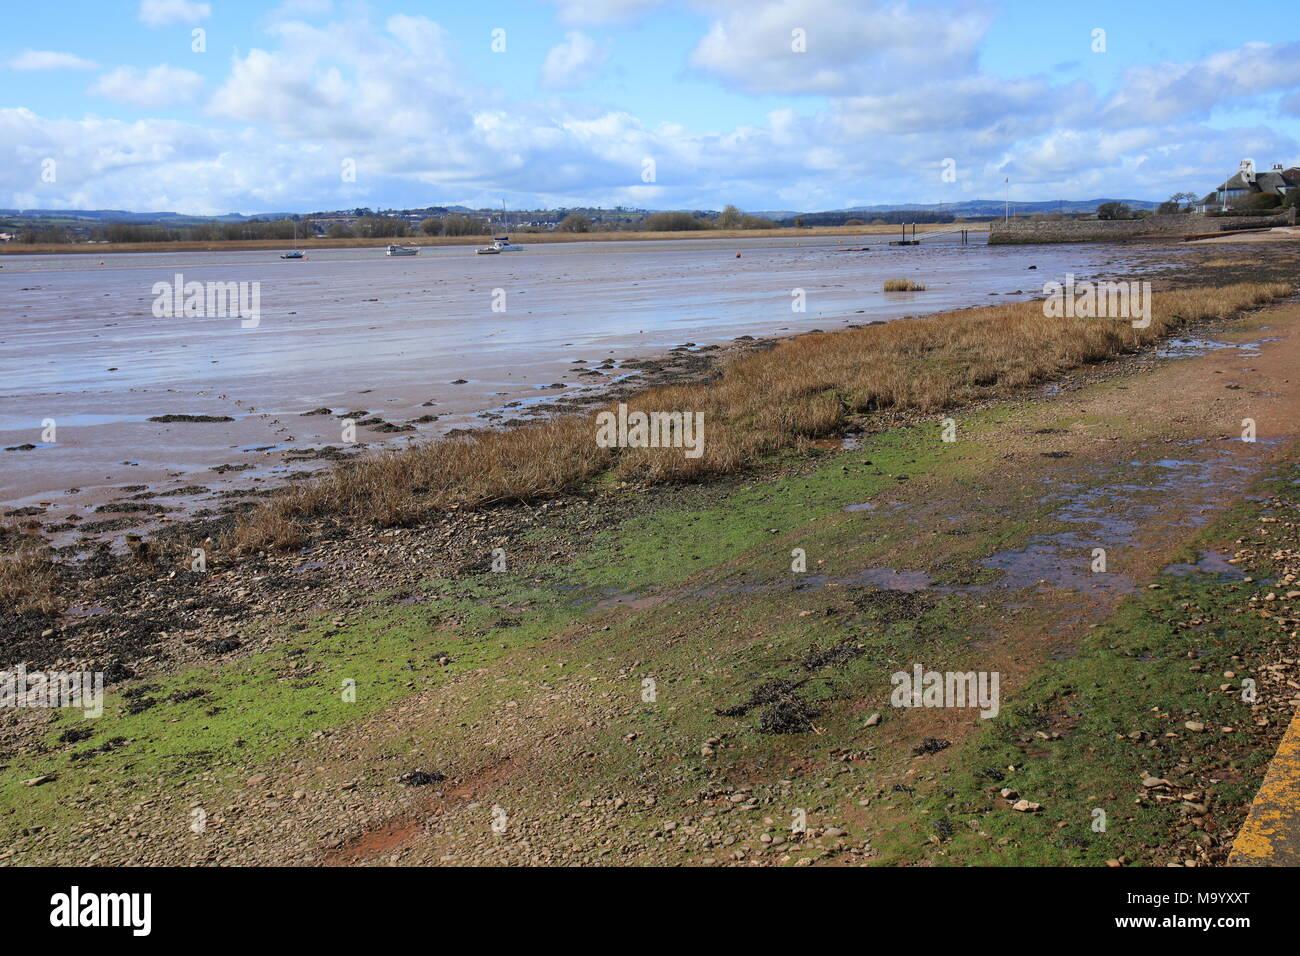 Exe estuary view towards Topsham from the goat walk, Topsham, Devon, England UK - Stock Image